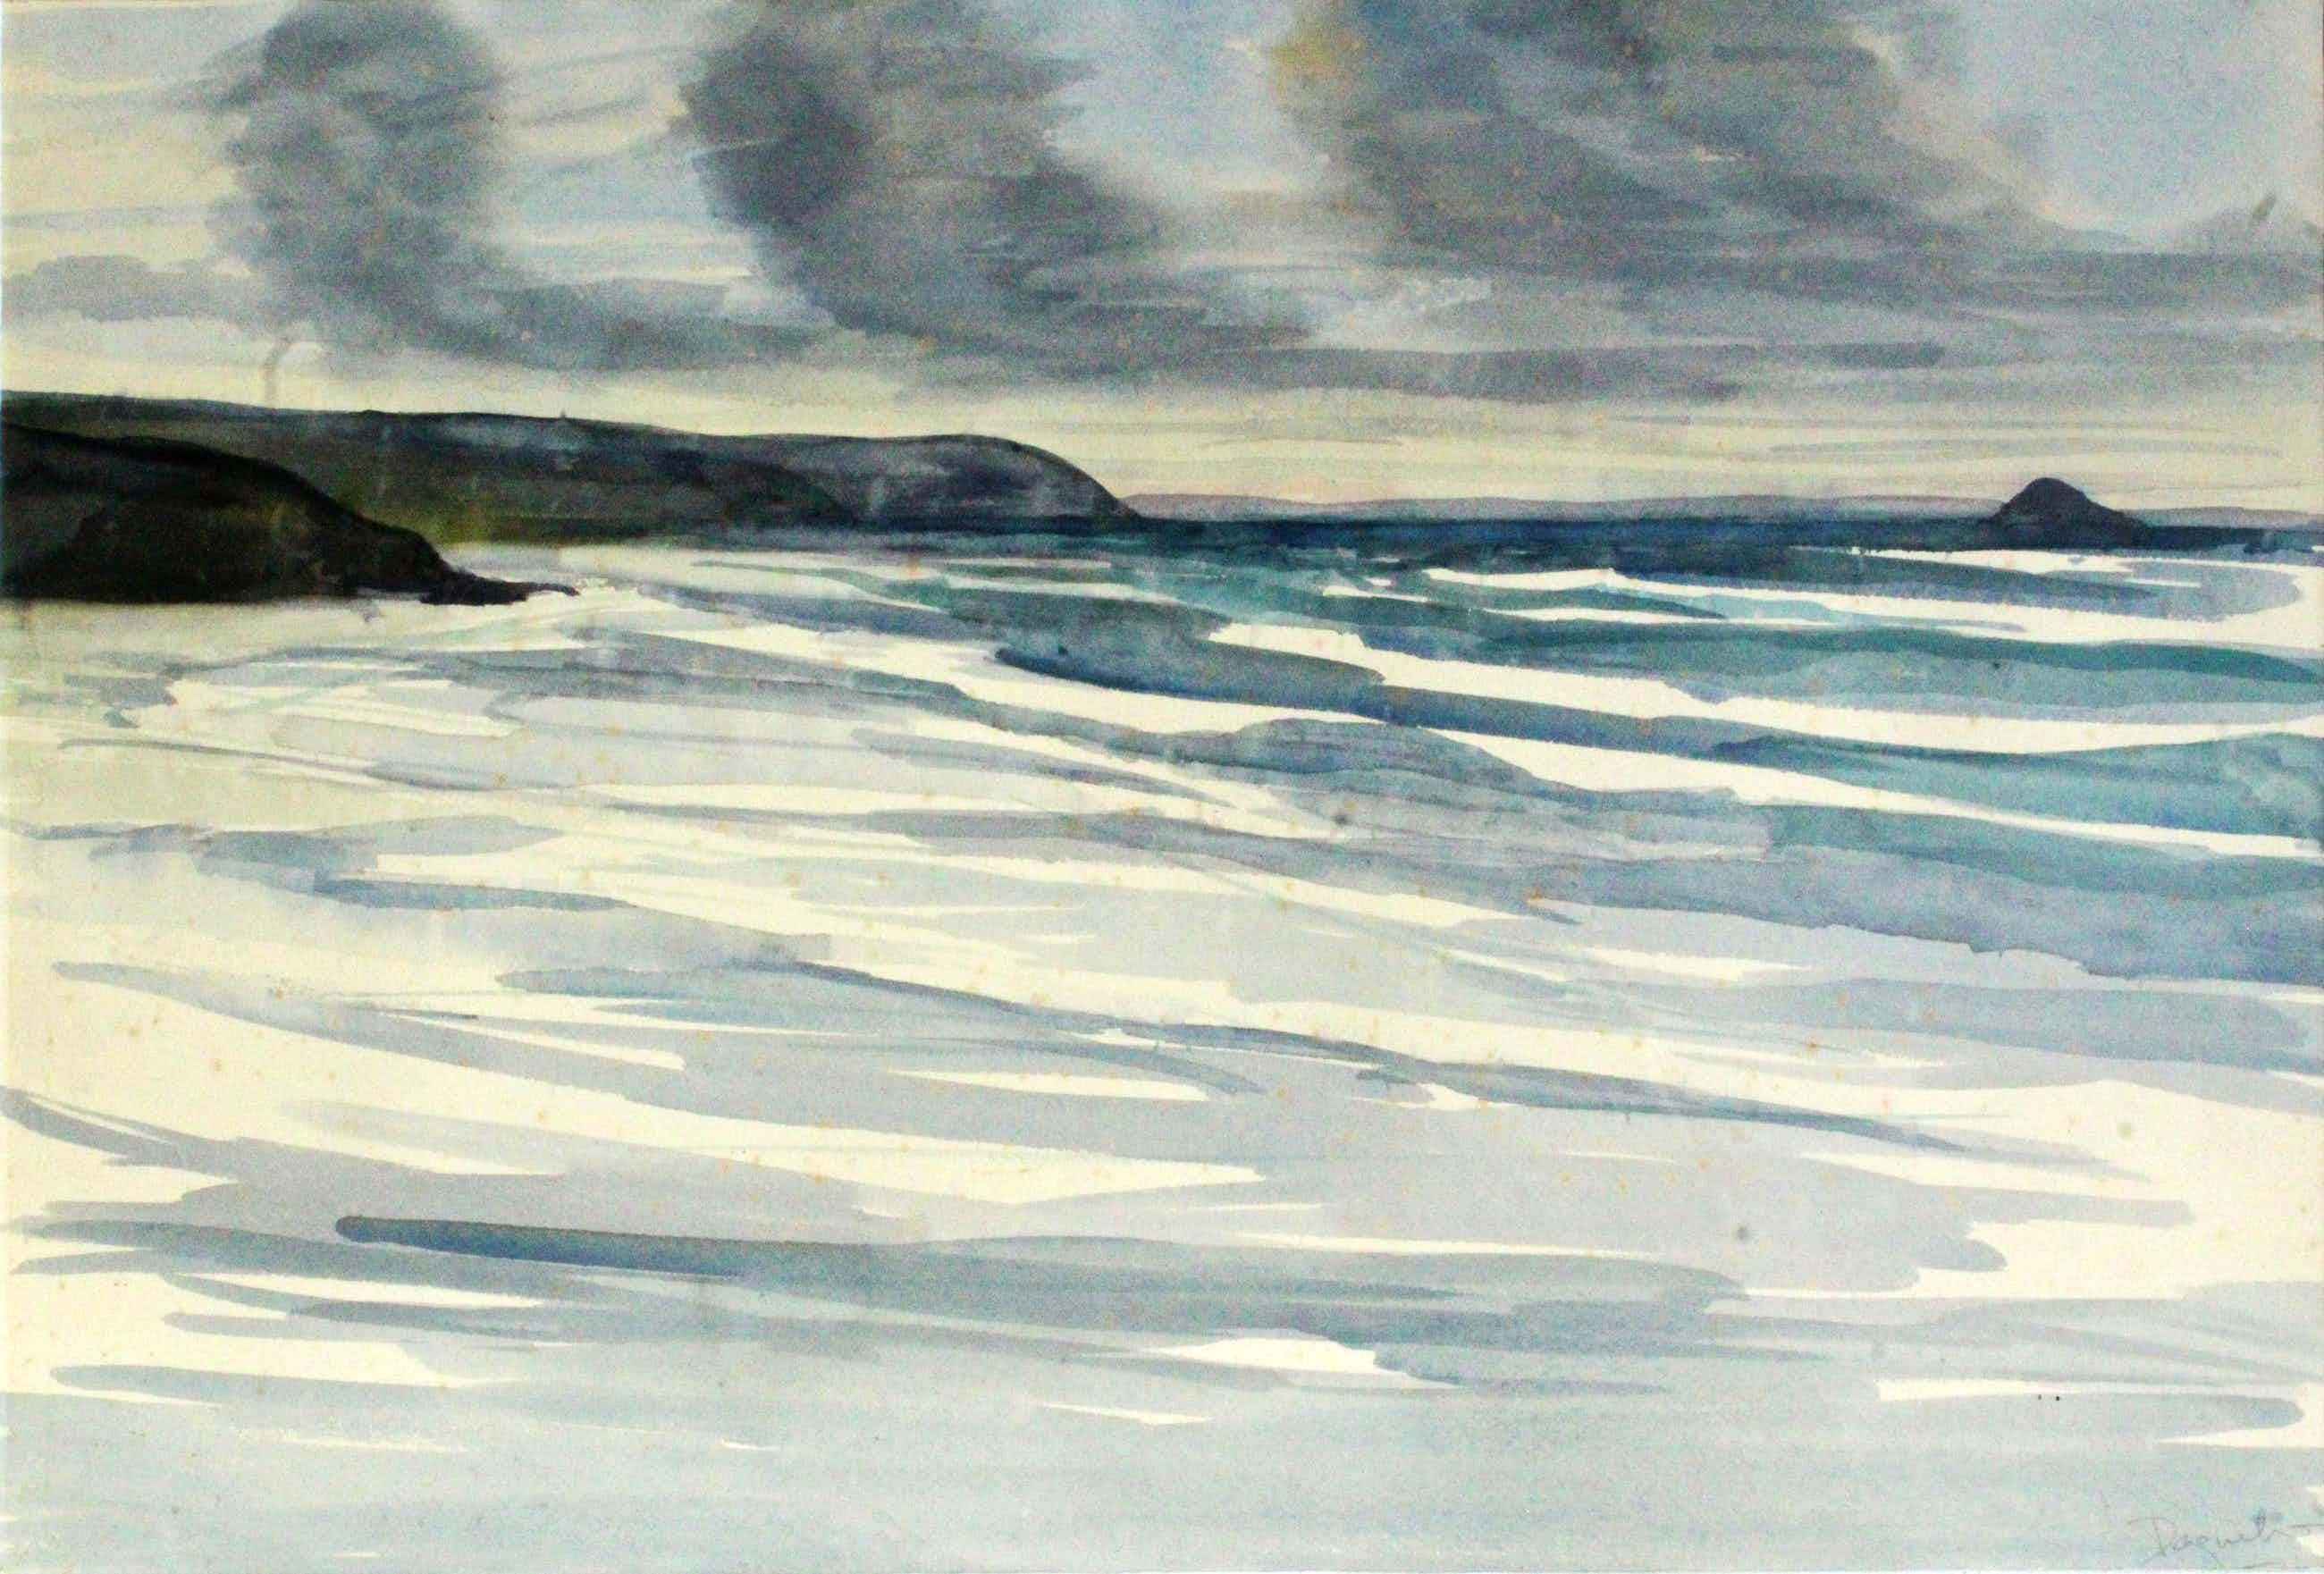 Marie Dagnelie - Storm in Bretagne kopen? Bied vanaf 150!